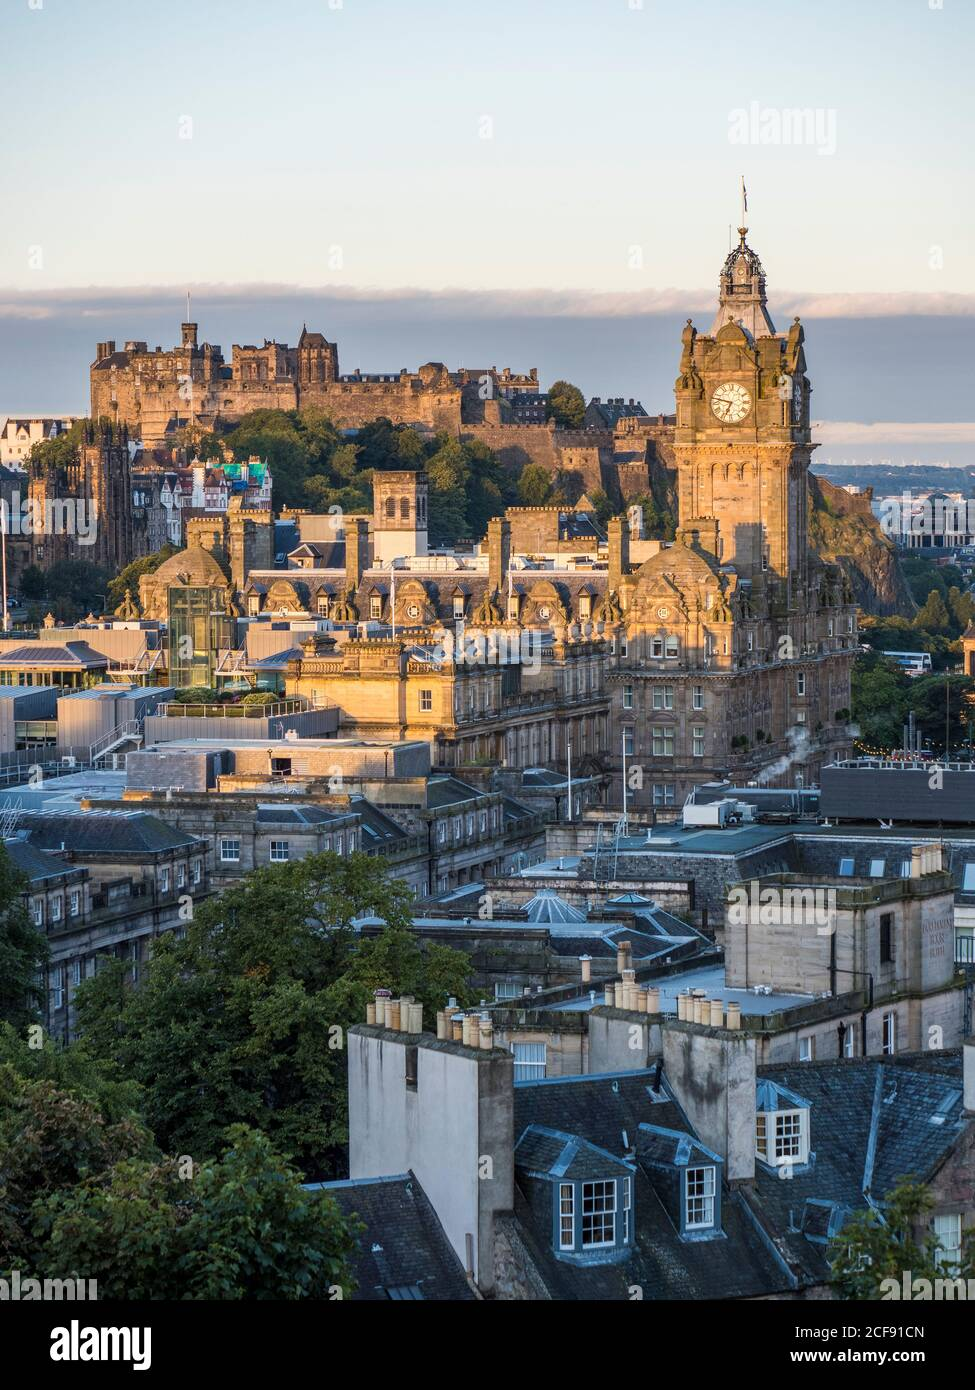 Sunrise, Landscape with the Tower of The Balmoral Hotel, and Edinburgh Castle, Edinburgh, Scotland, UK, GB. Stock Photo